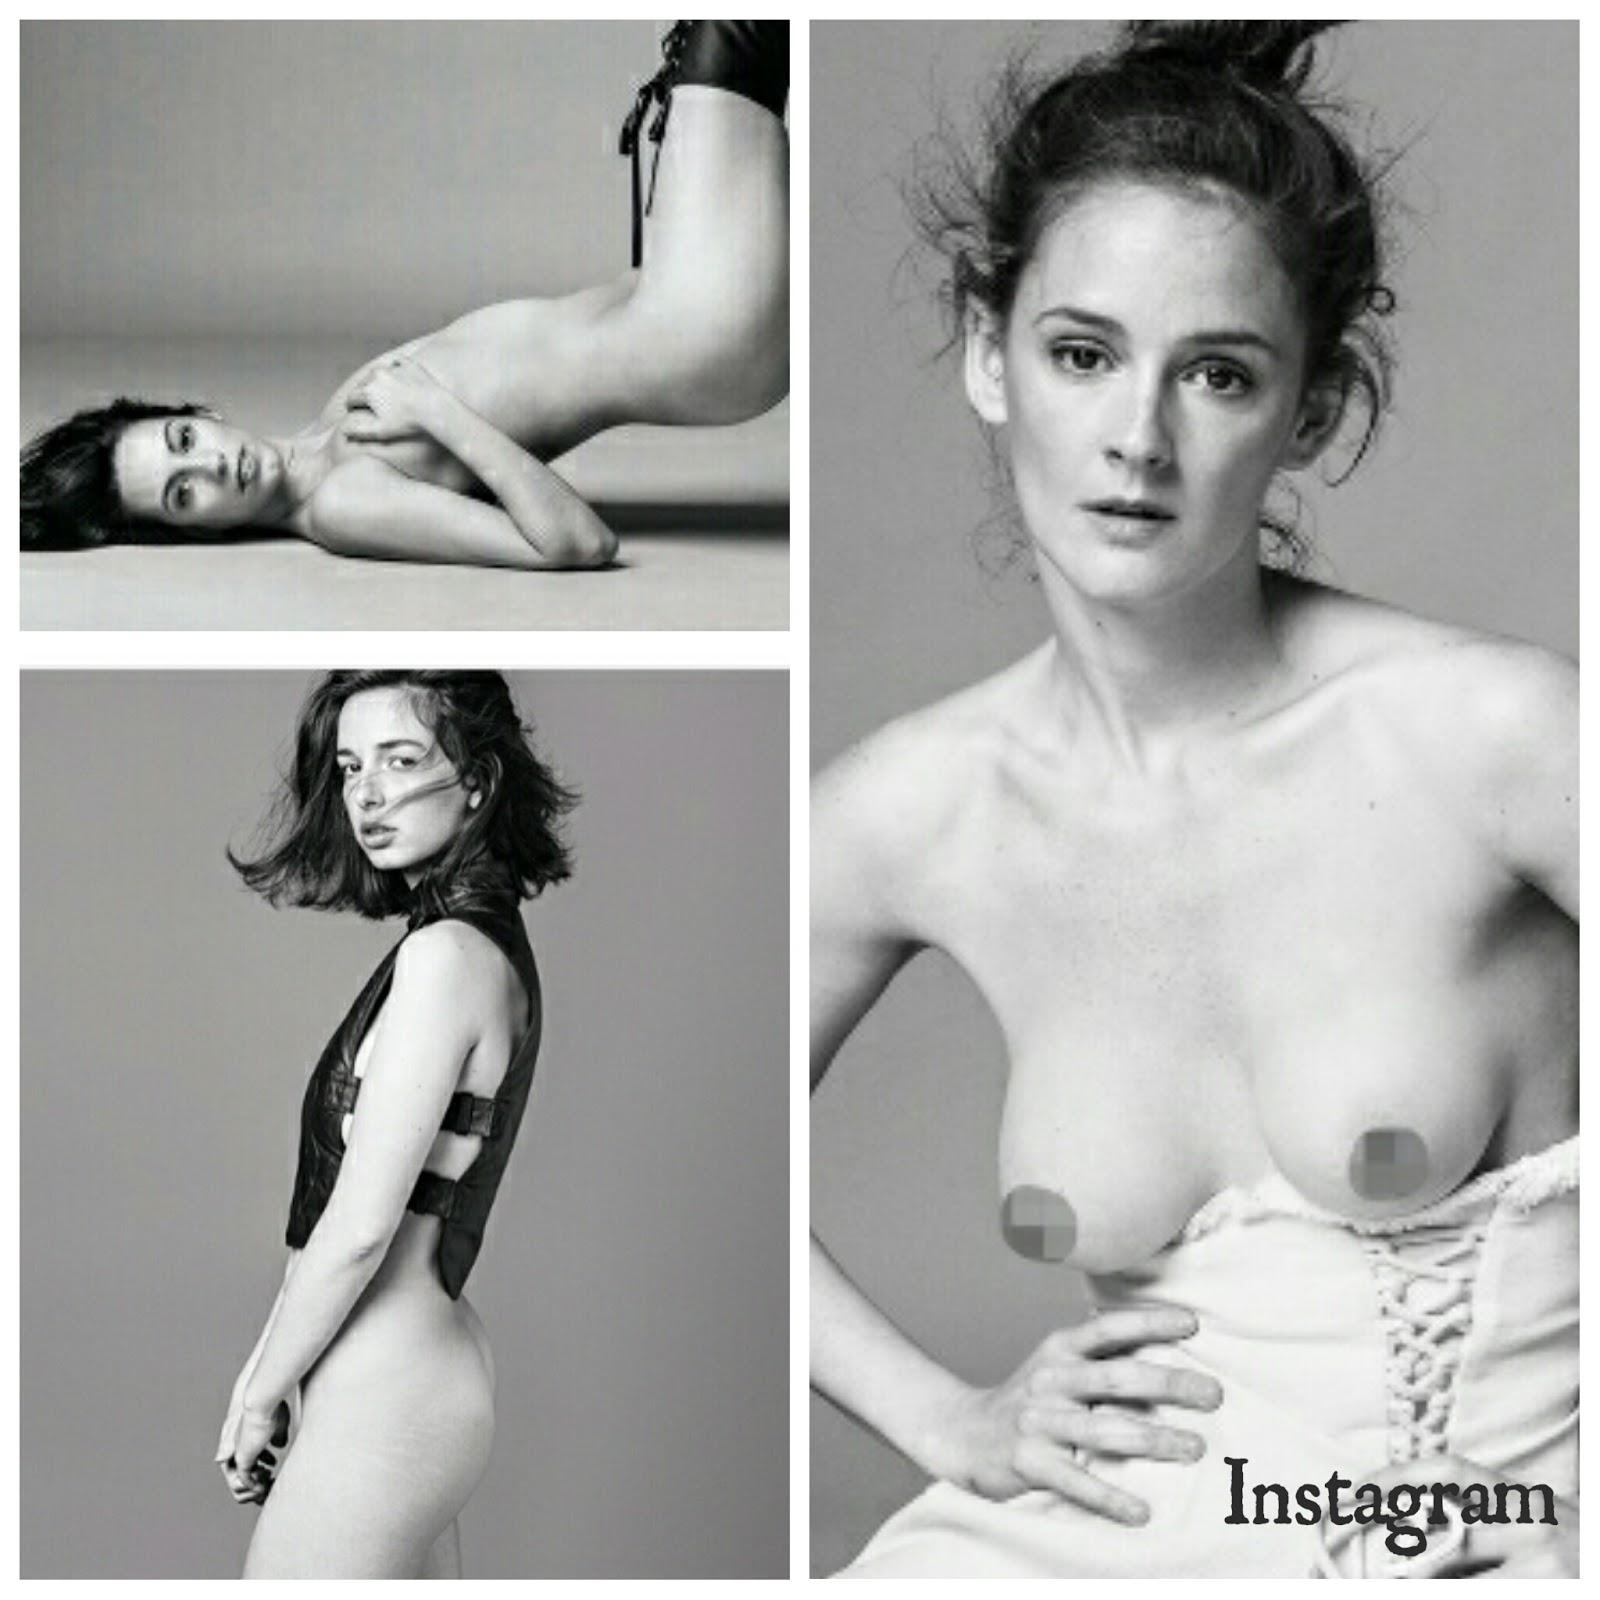 Ana Polvorosa Desnuda almudena cid y ana polvorosa, desnudas por la libertad